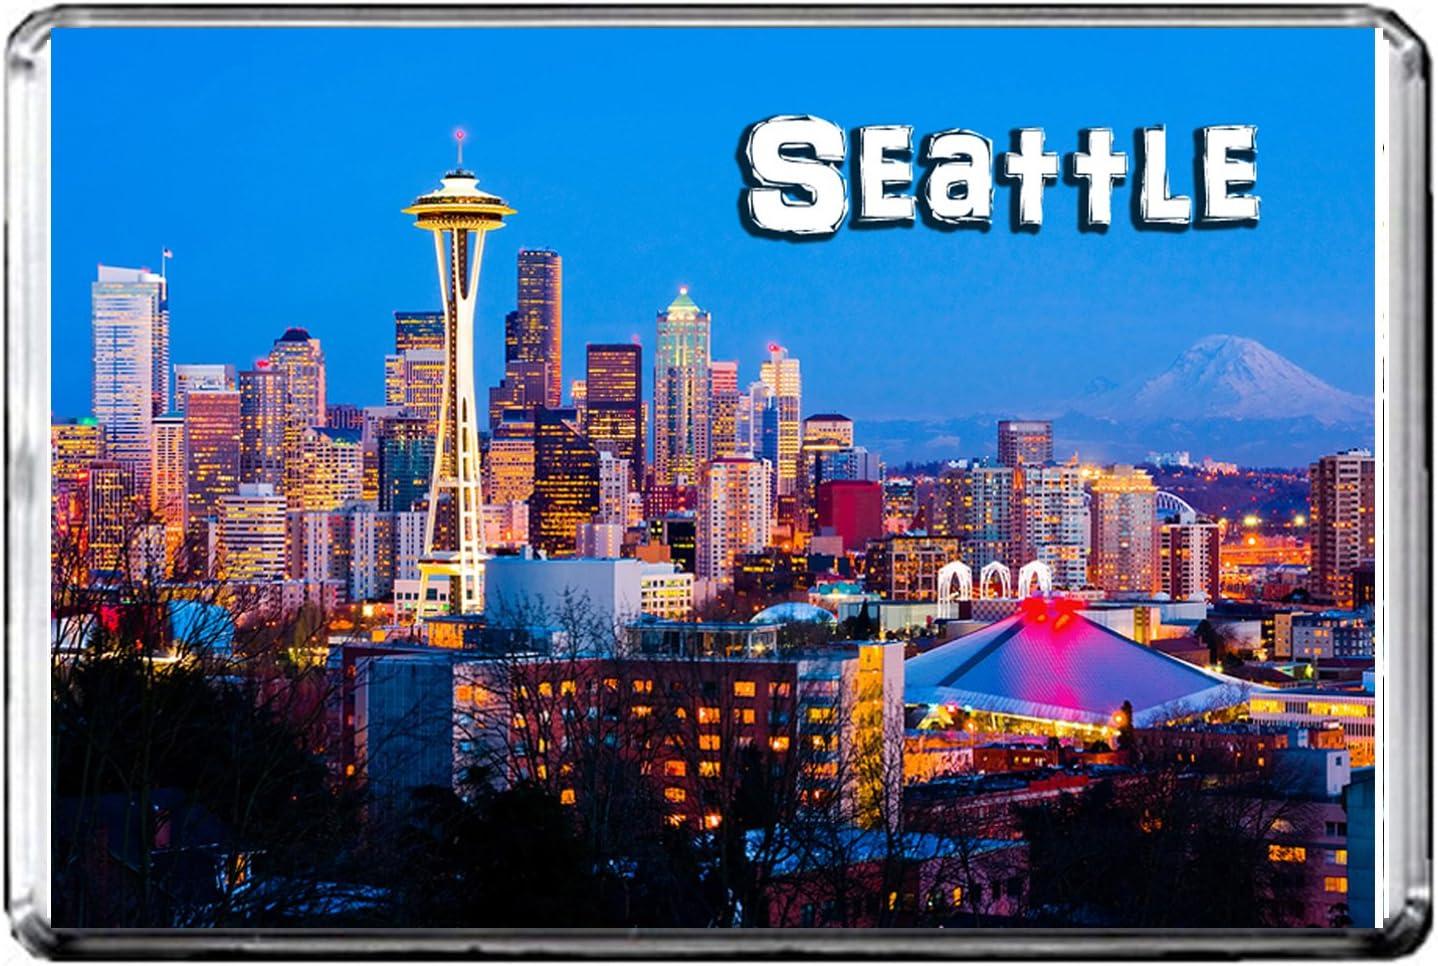 E204 Seattle Fridge Magnet USA Travel Photo Refrigerator Magnet